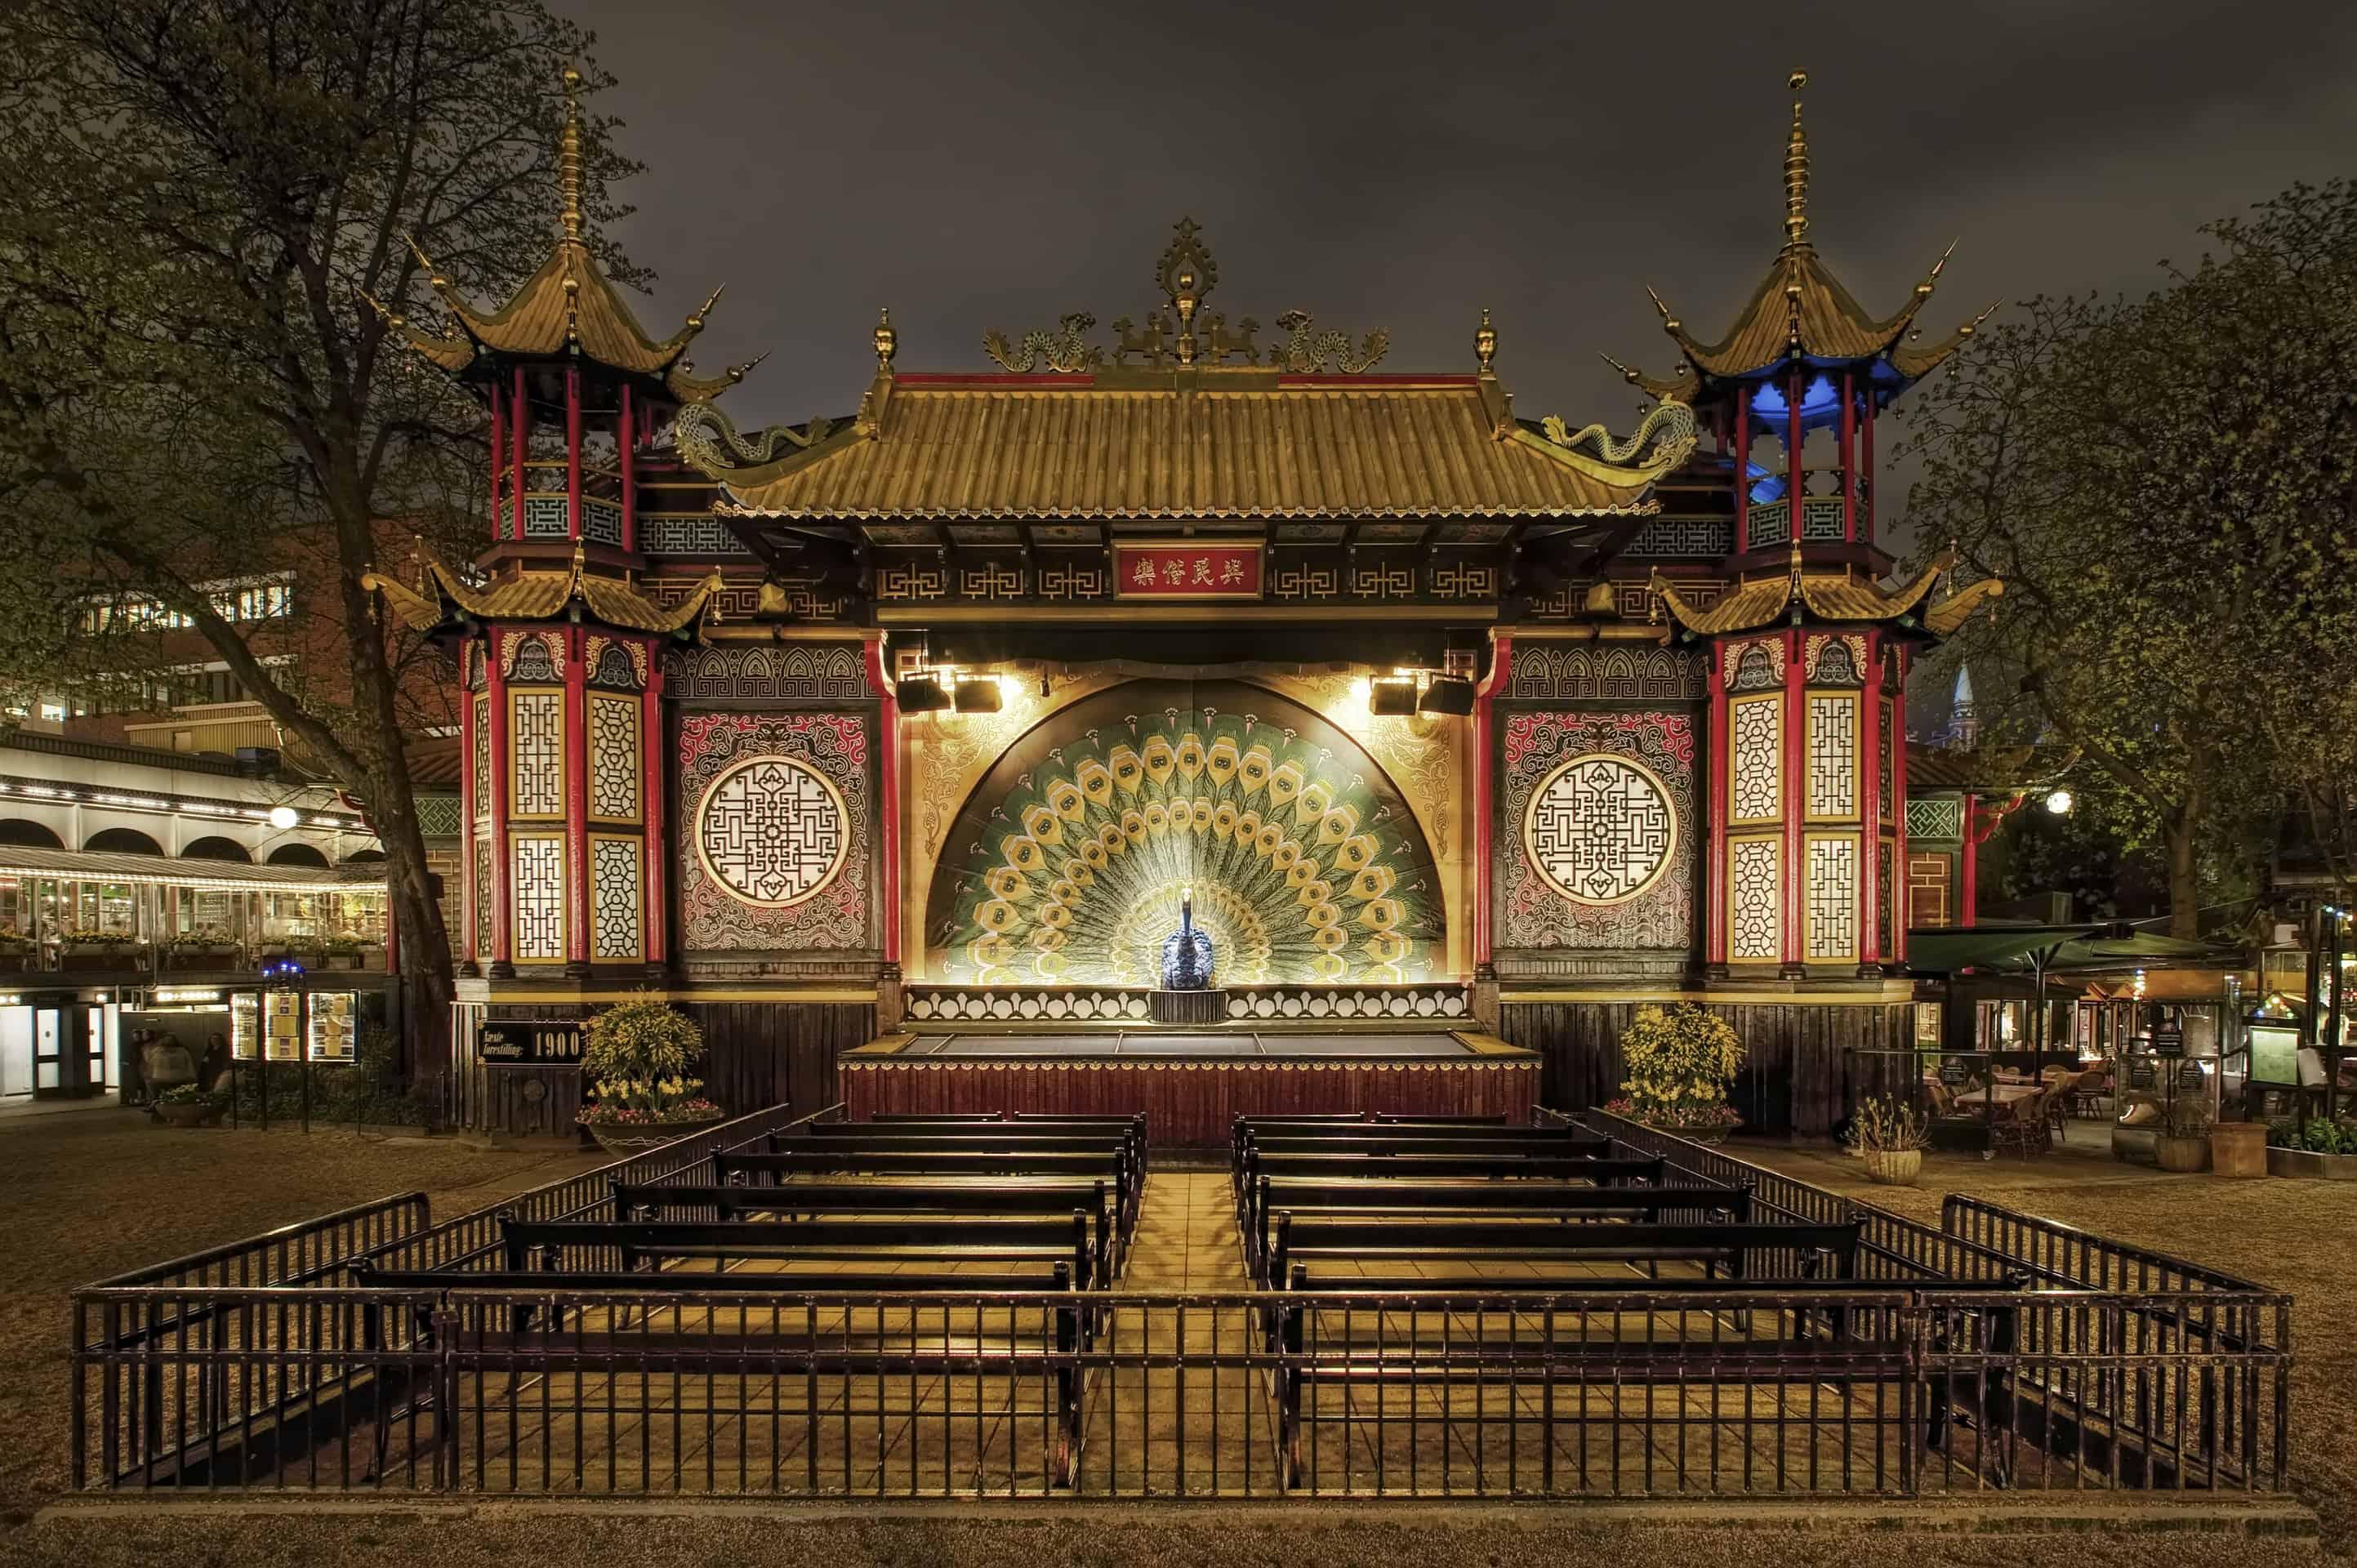 The pantomime theatre at Tivoli Gardens